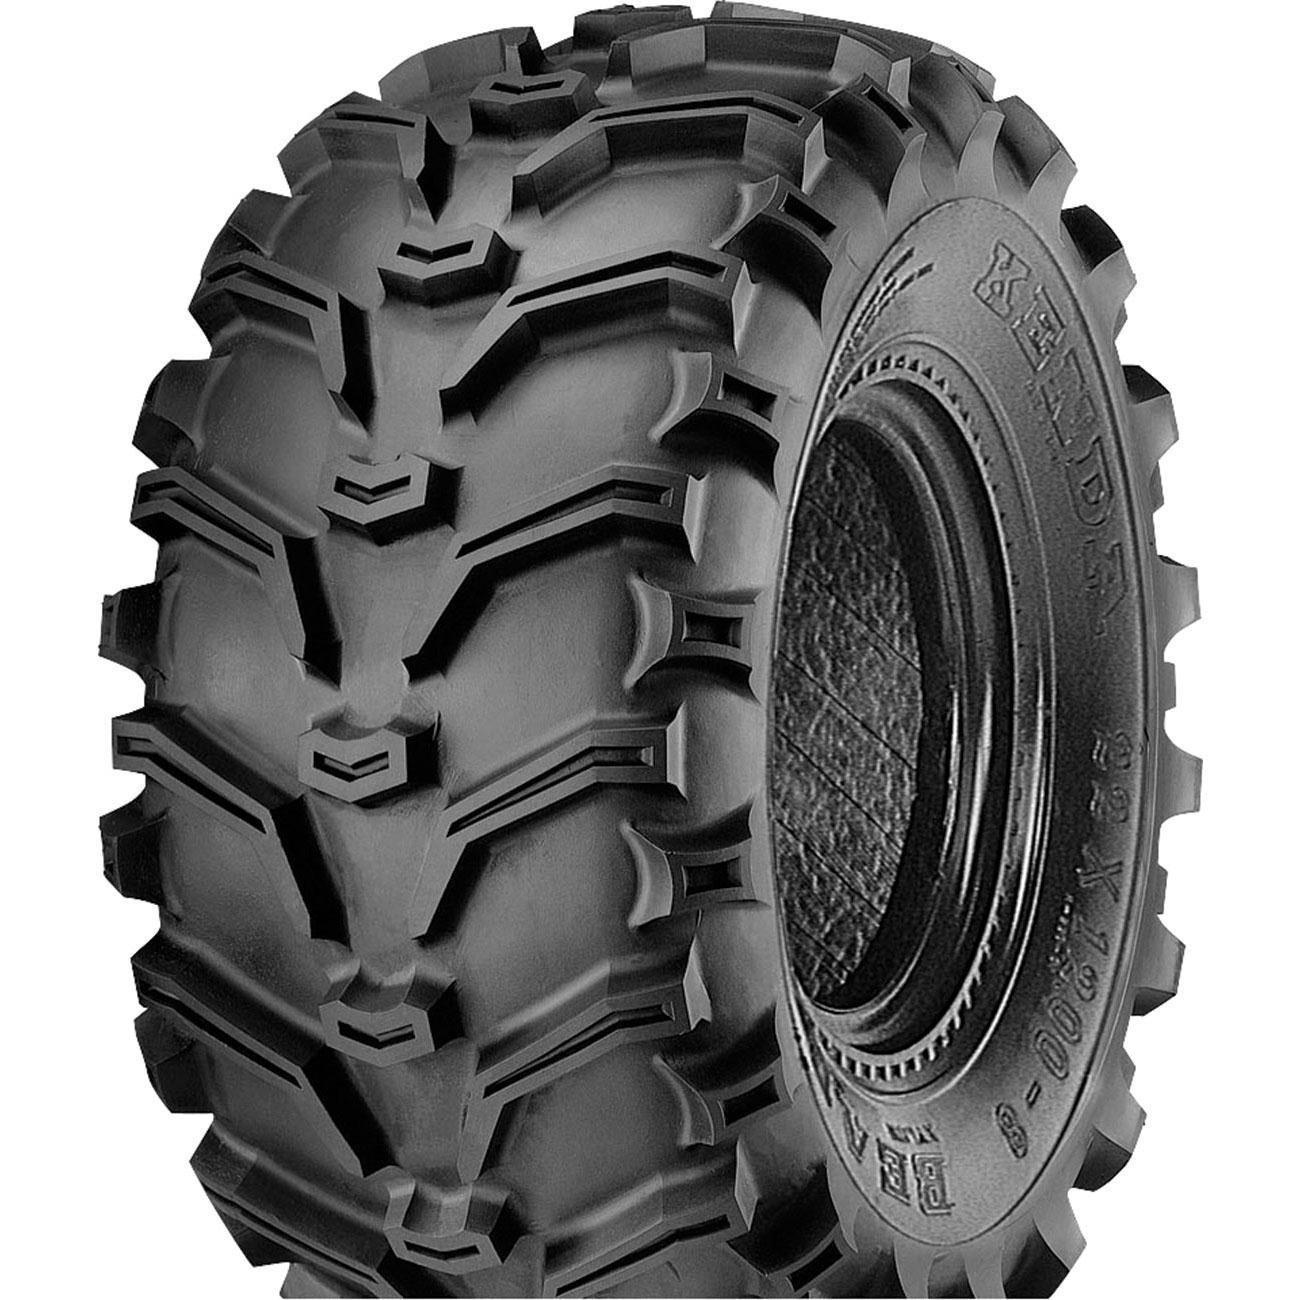 Kenda K299 Bear Claw Tire - Front/Rear - 26x11x12 , Position: Front/Rear, Rim Size: 12, Tire Application: Mud/Snow, Tire Size: 26x11x12, Tire Type: ATV/UTV, Tire Ply: 6 25492000 by Kenda (Image #1)